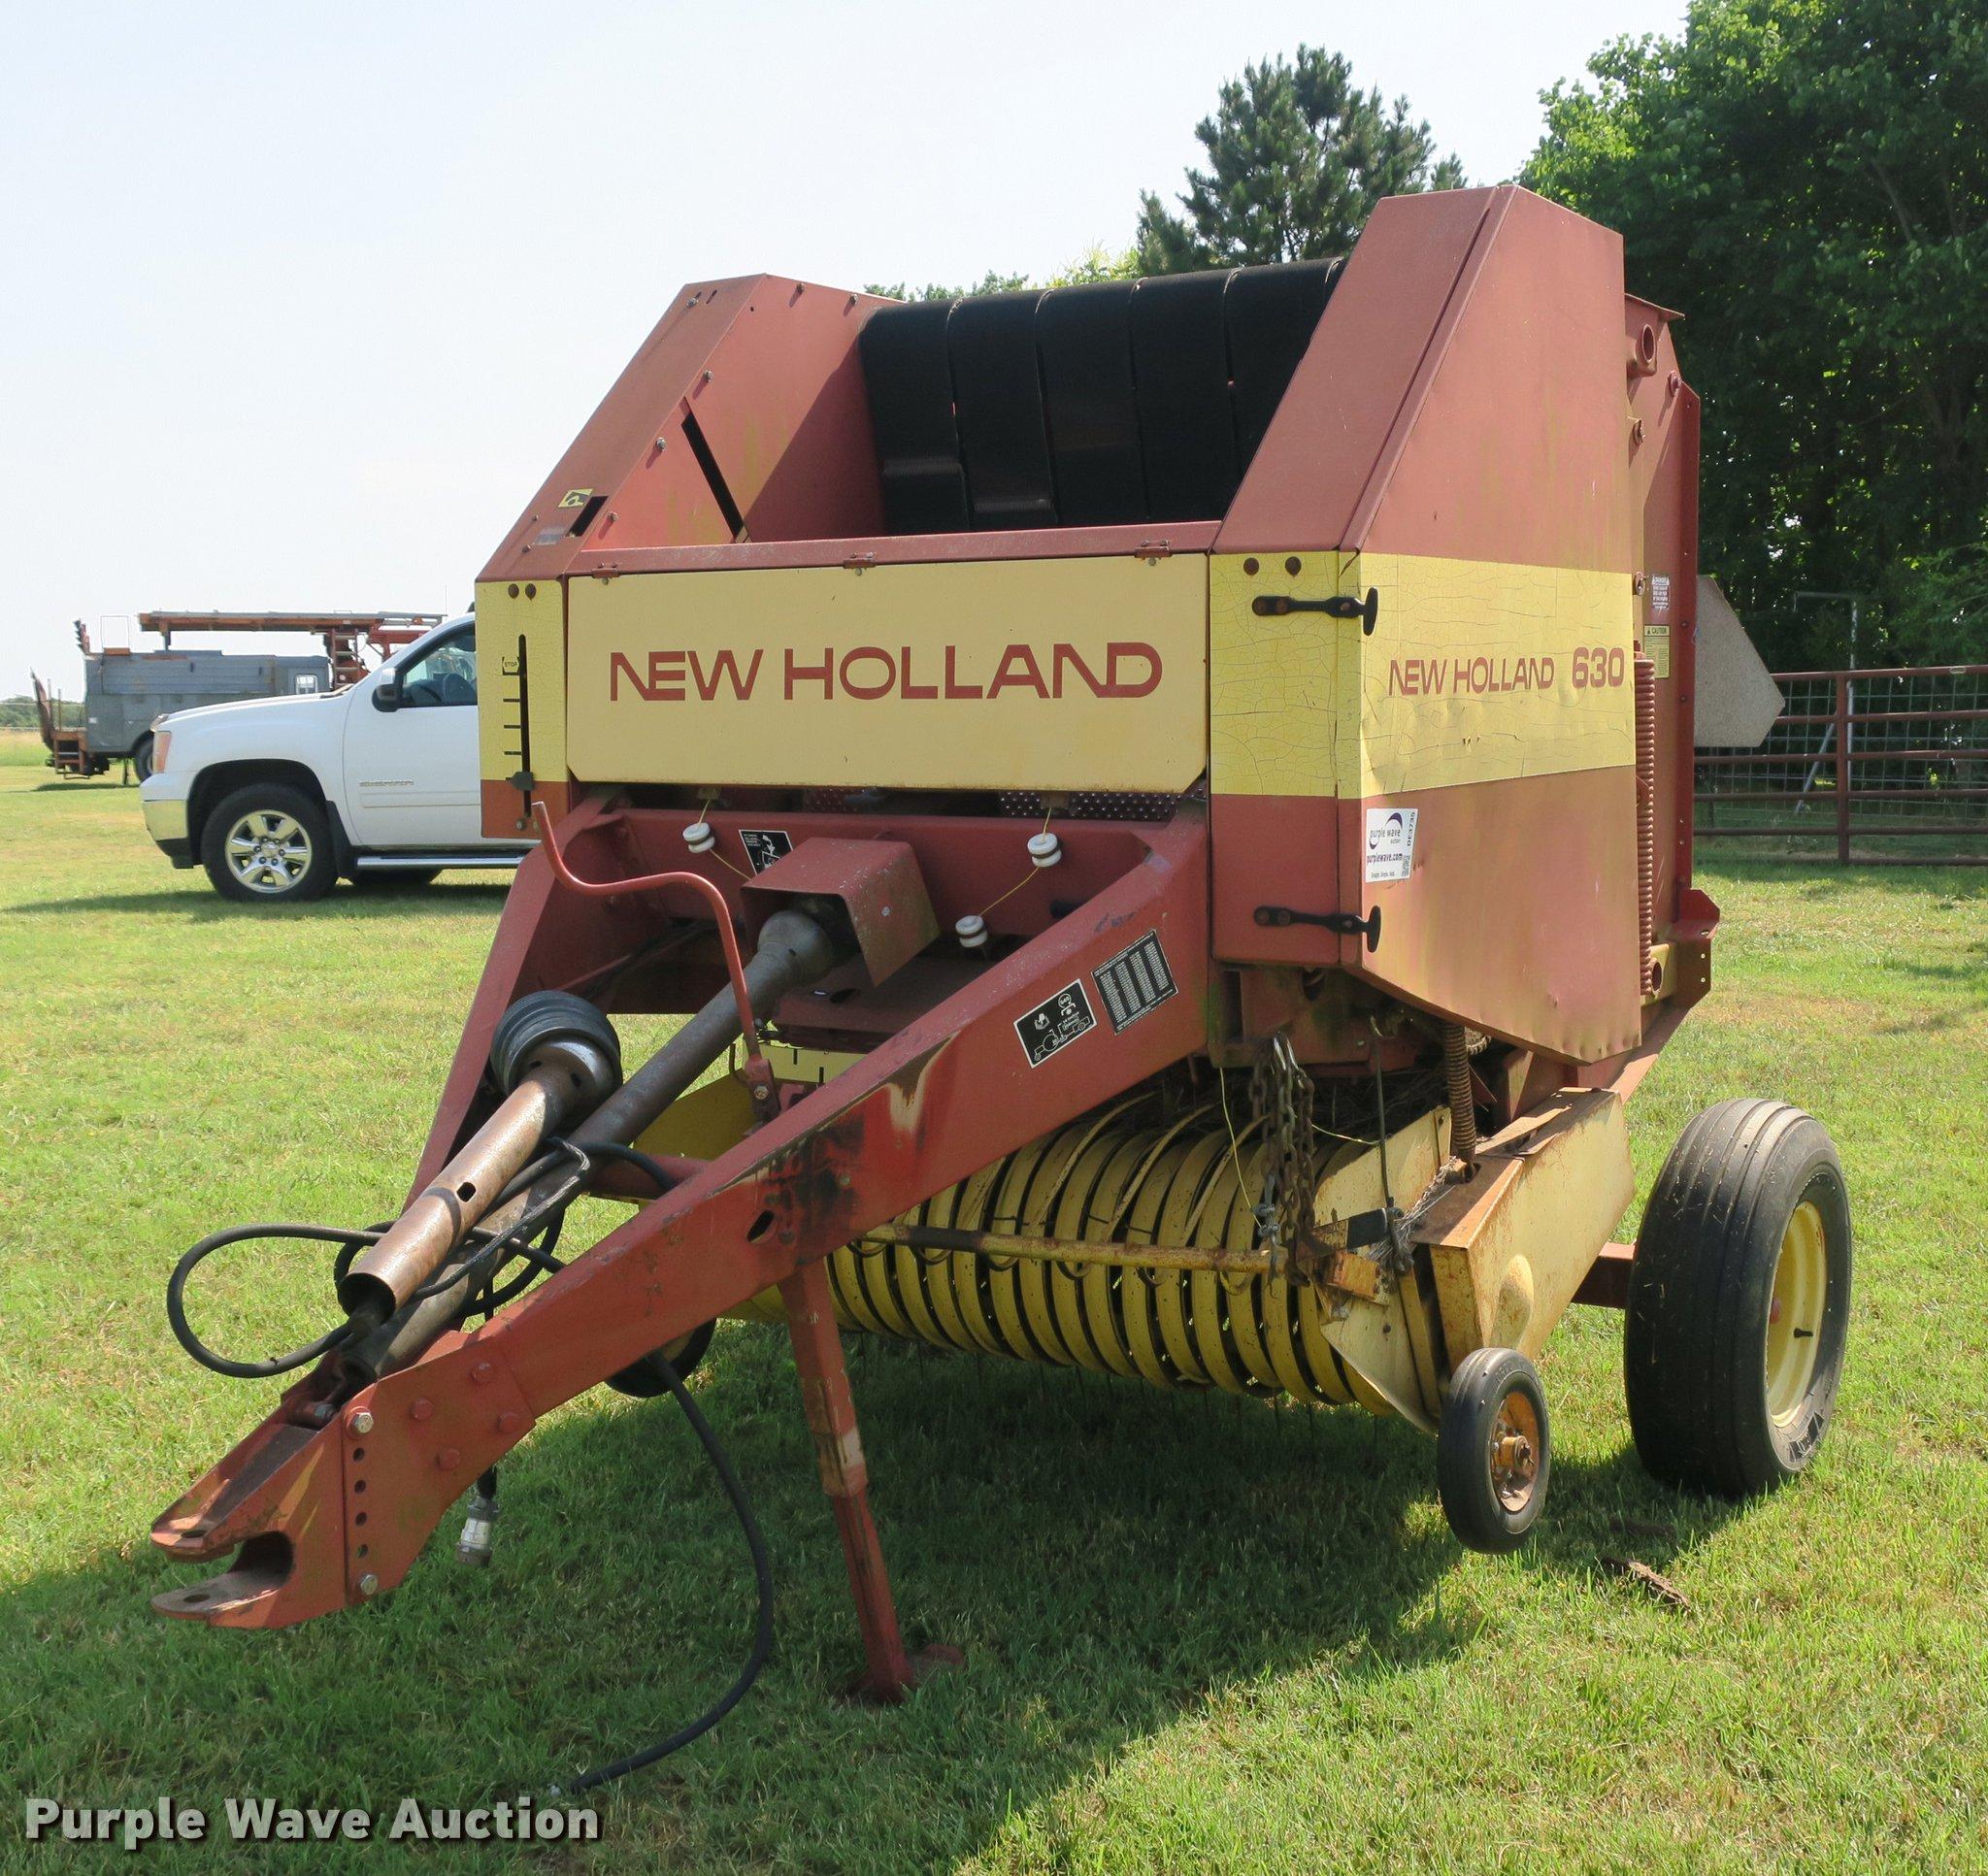 WRG-5324] New Holland 630 Round Baler Operators Manual